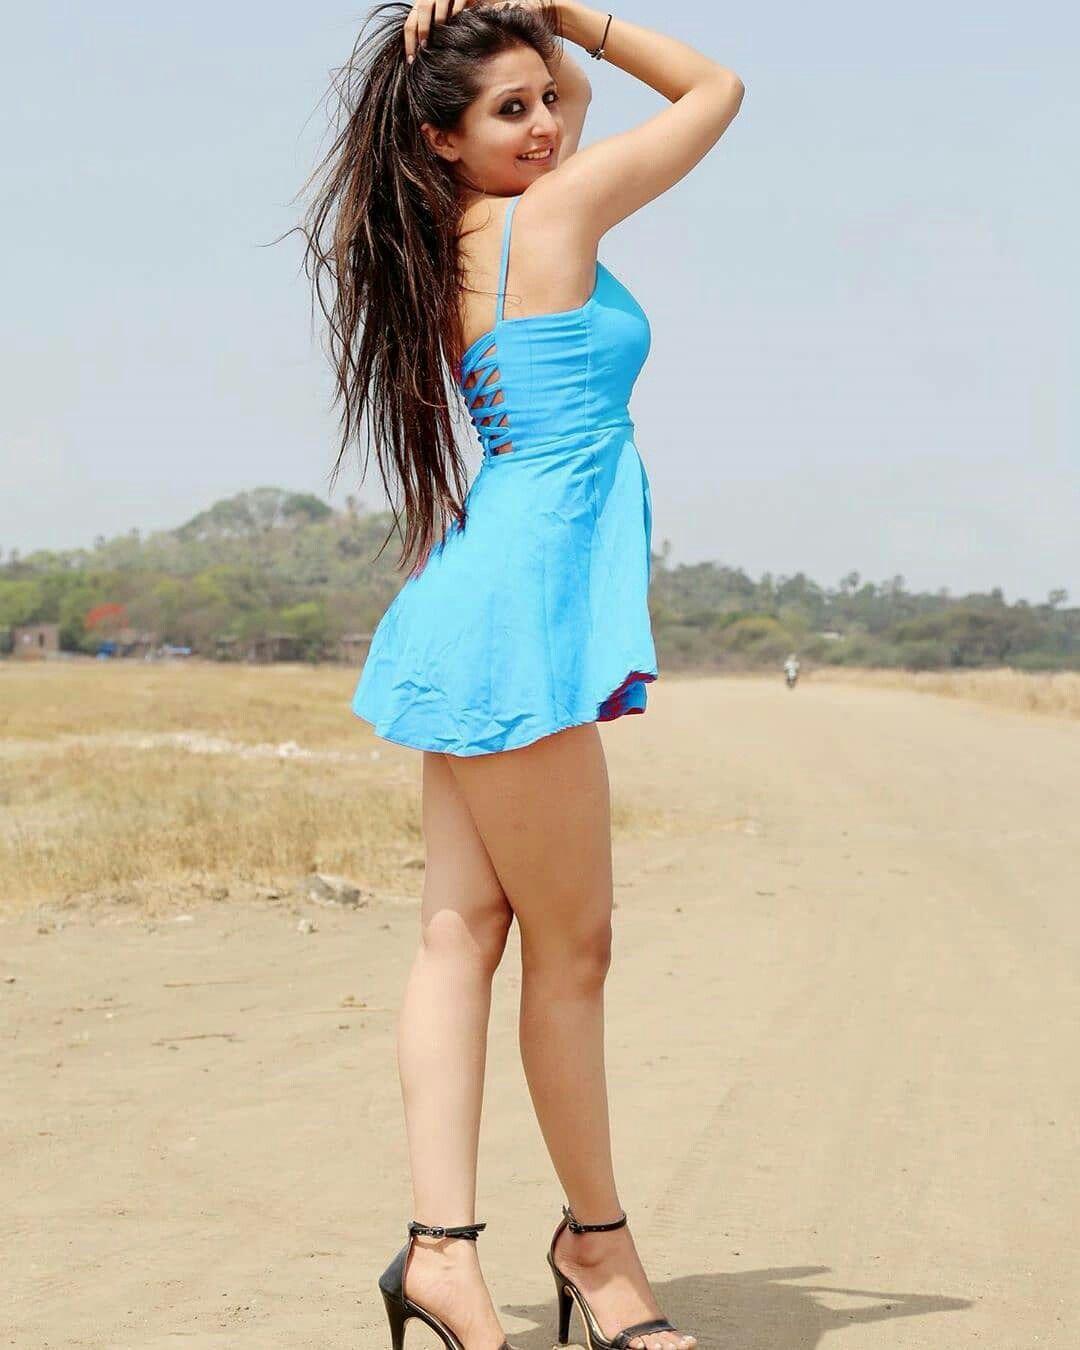 indian girls in short dresses